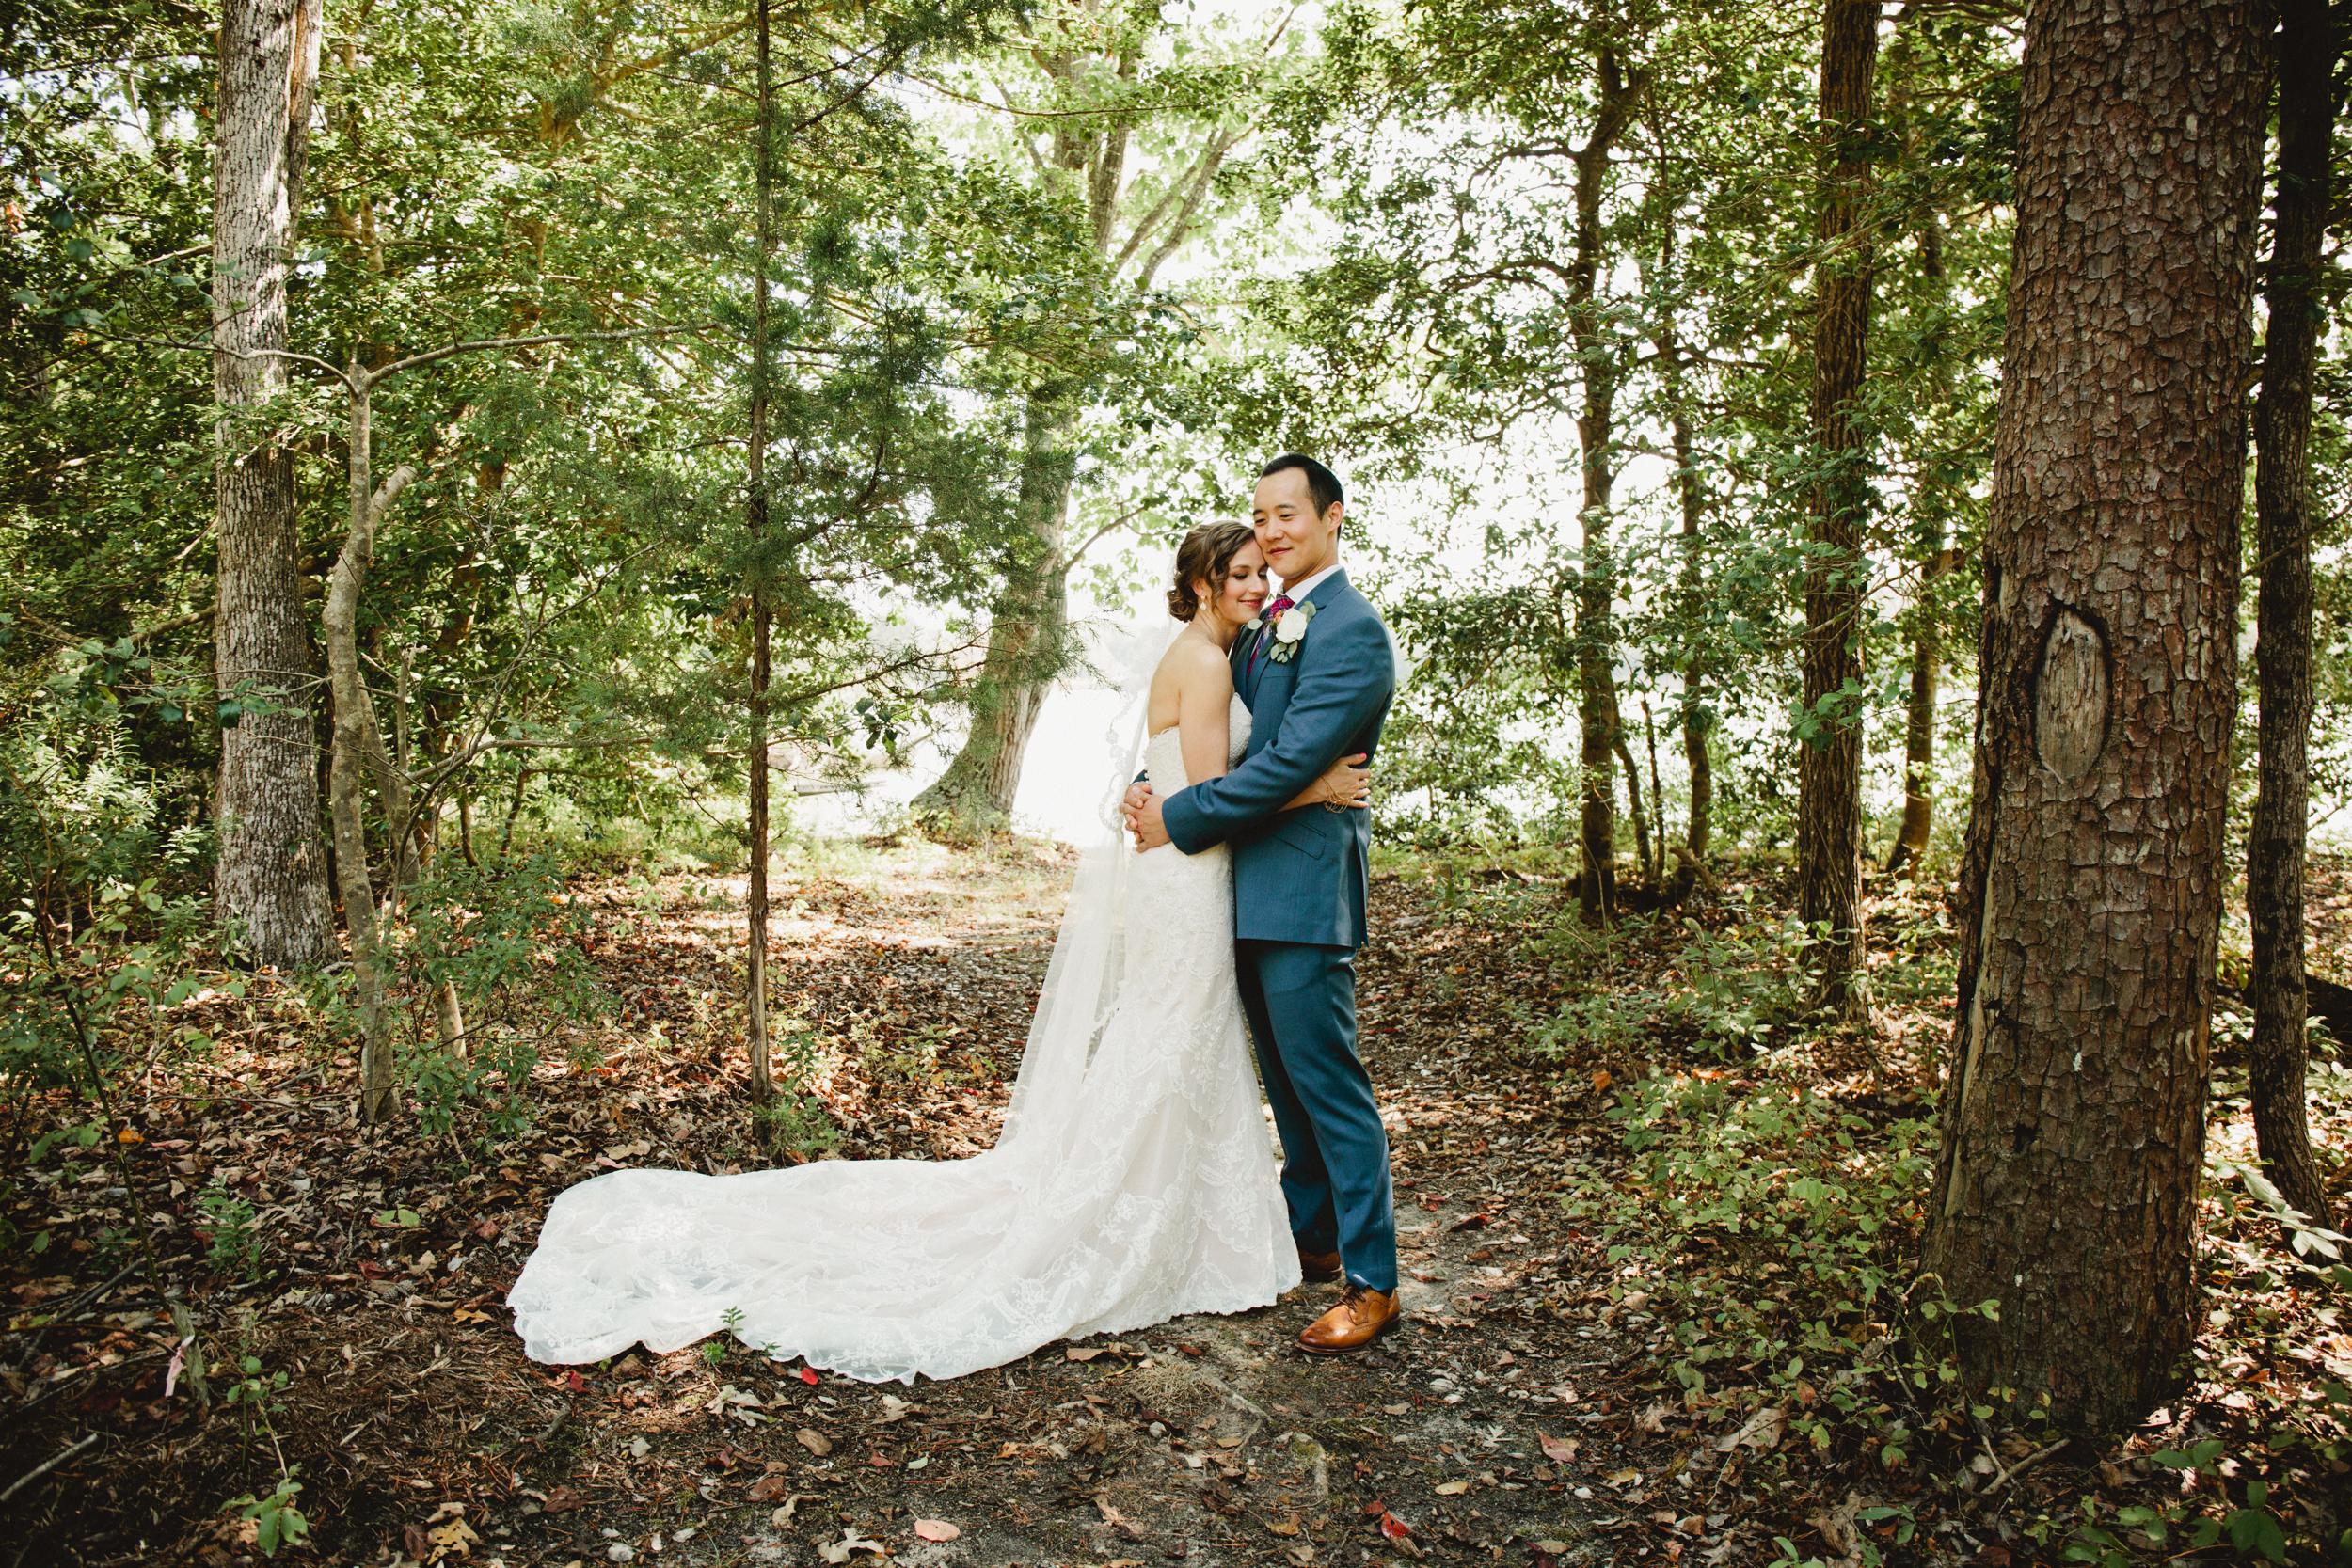 Maine-Wedding-Photographer-971.jpg